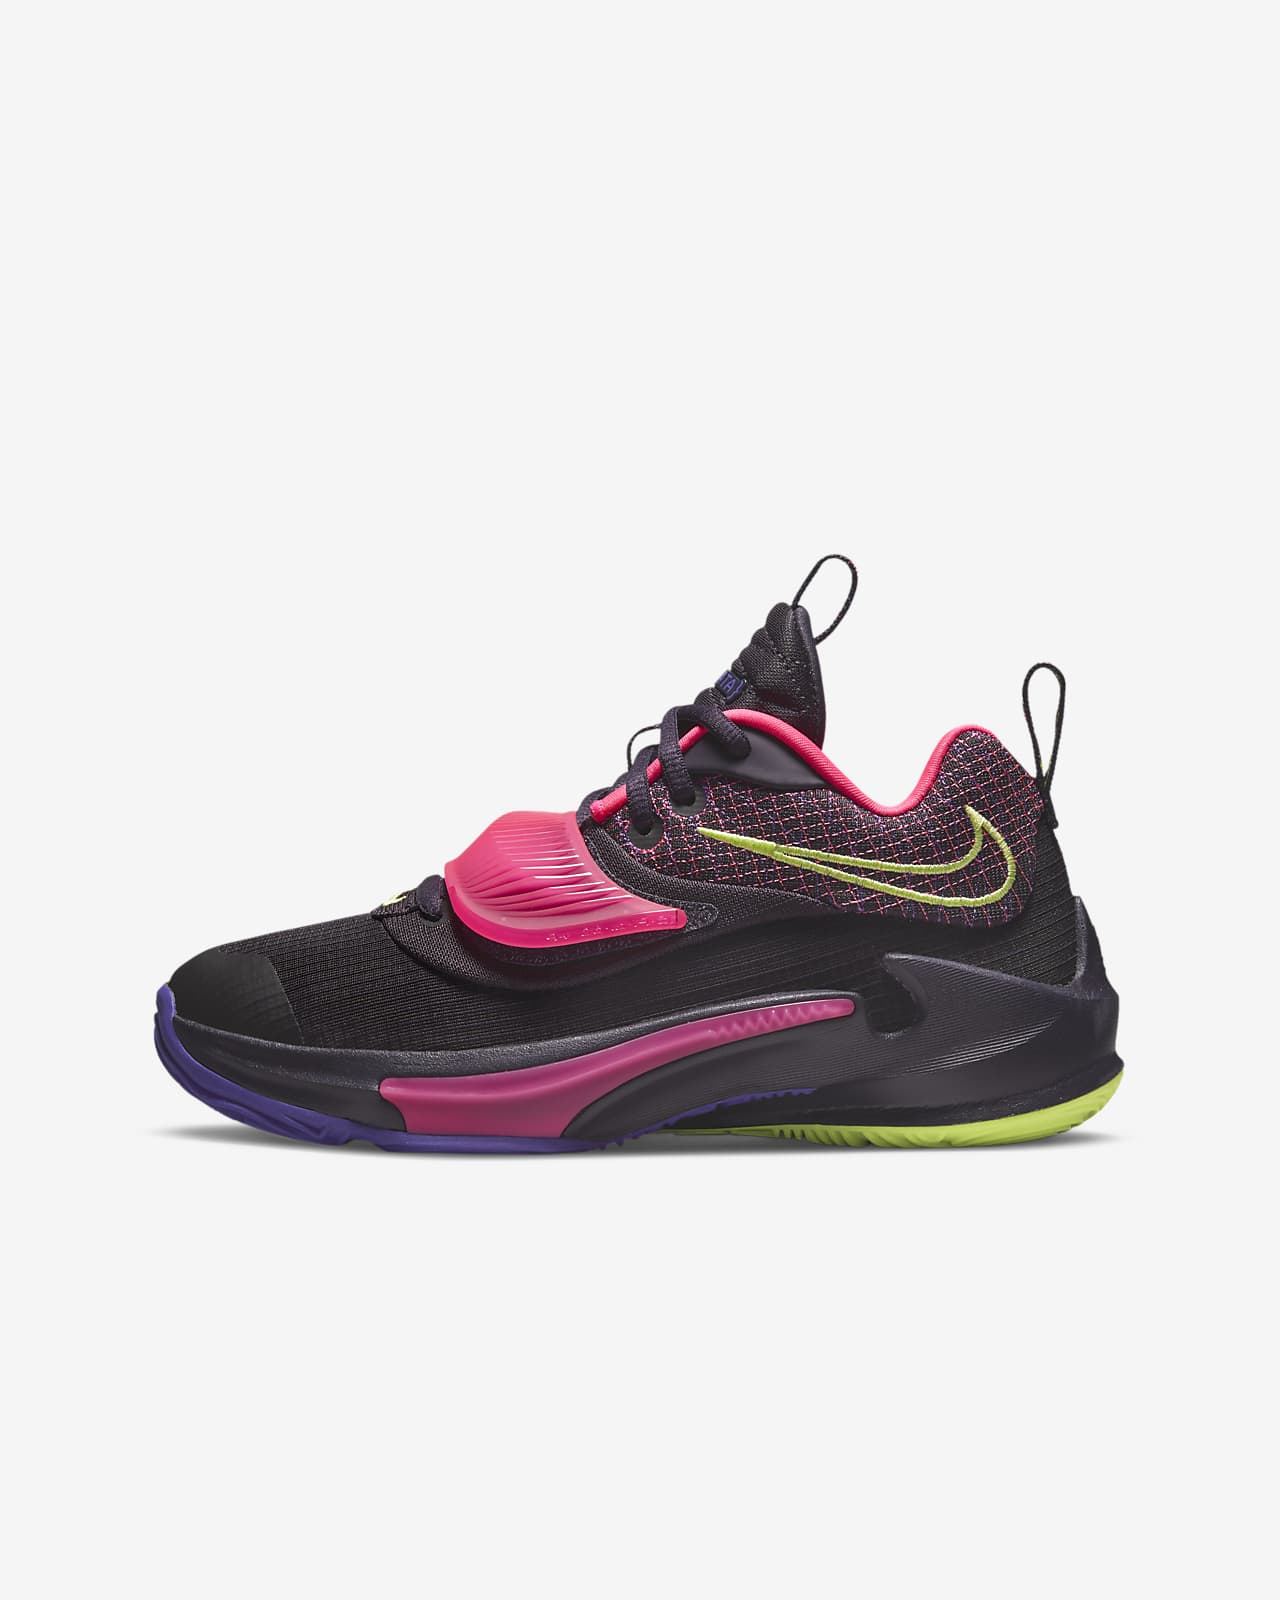 Freak 3 Big Kids' Basketball Shoes